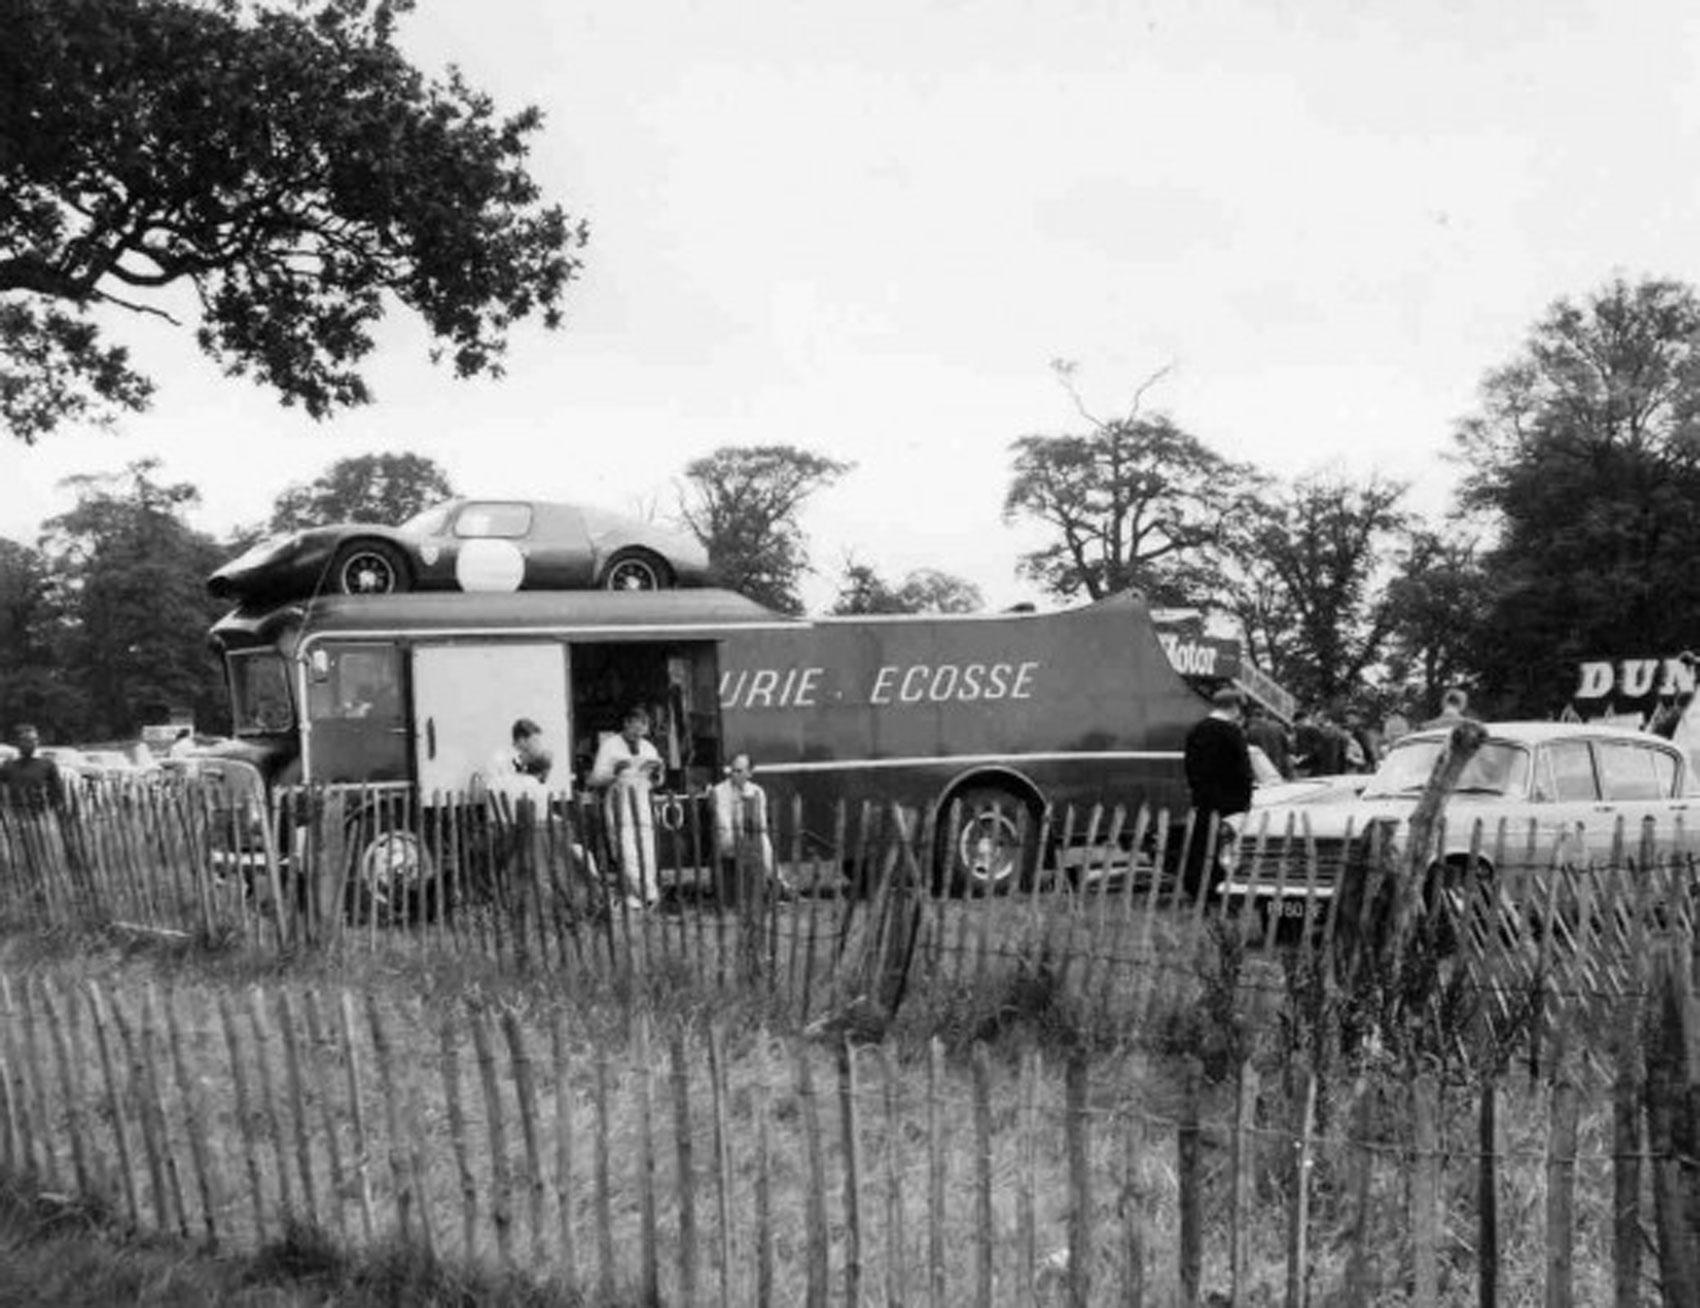 Ecurie Ecosse transporter photograph